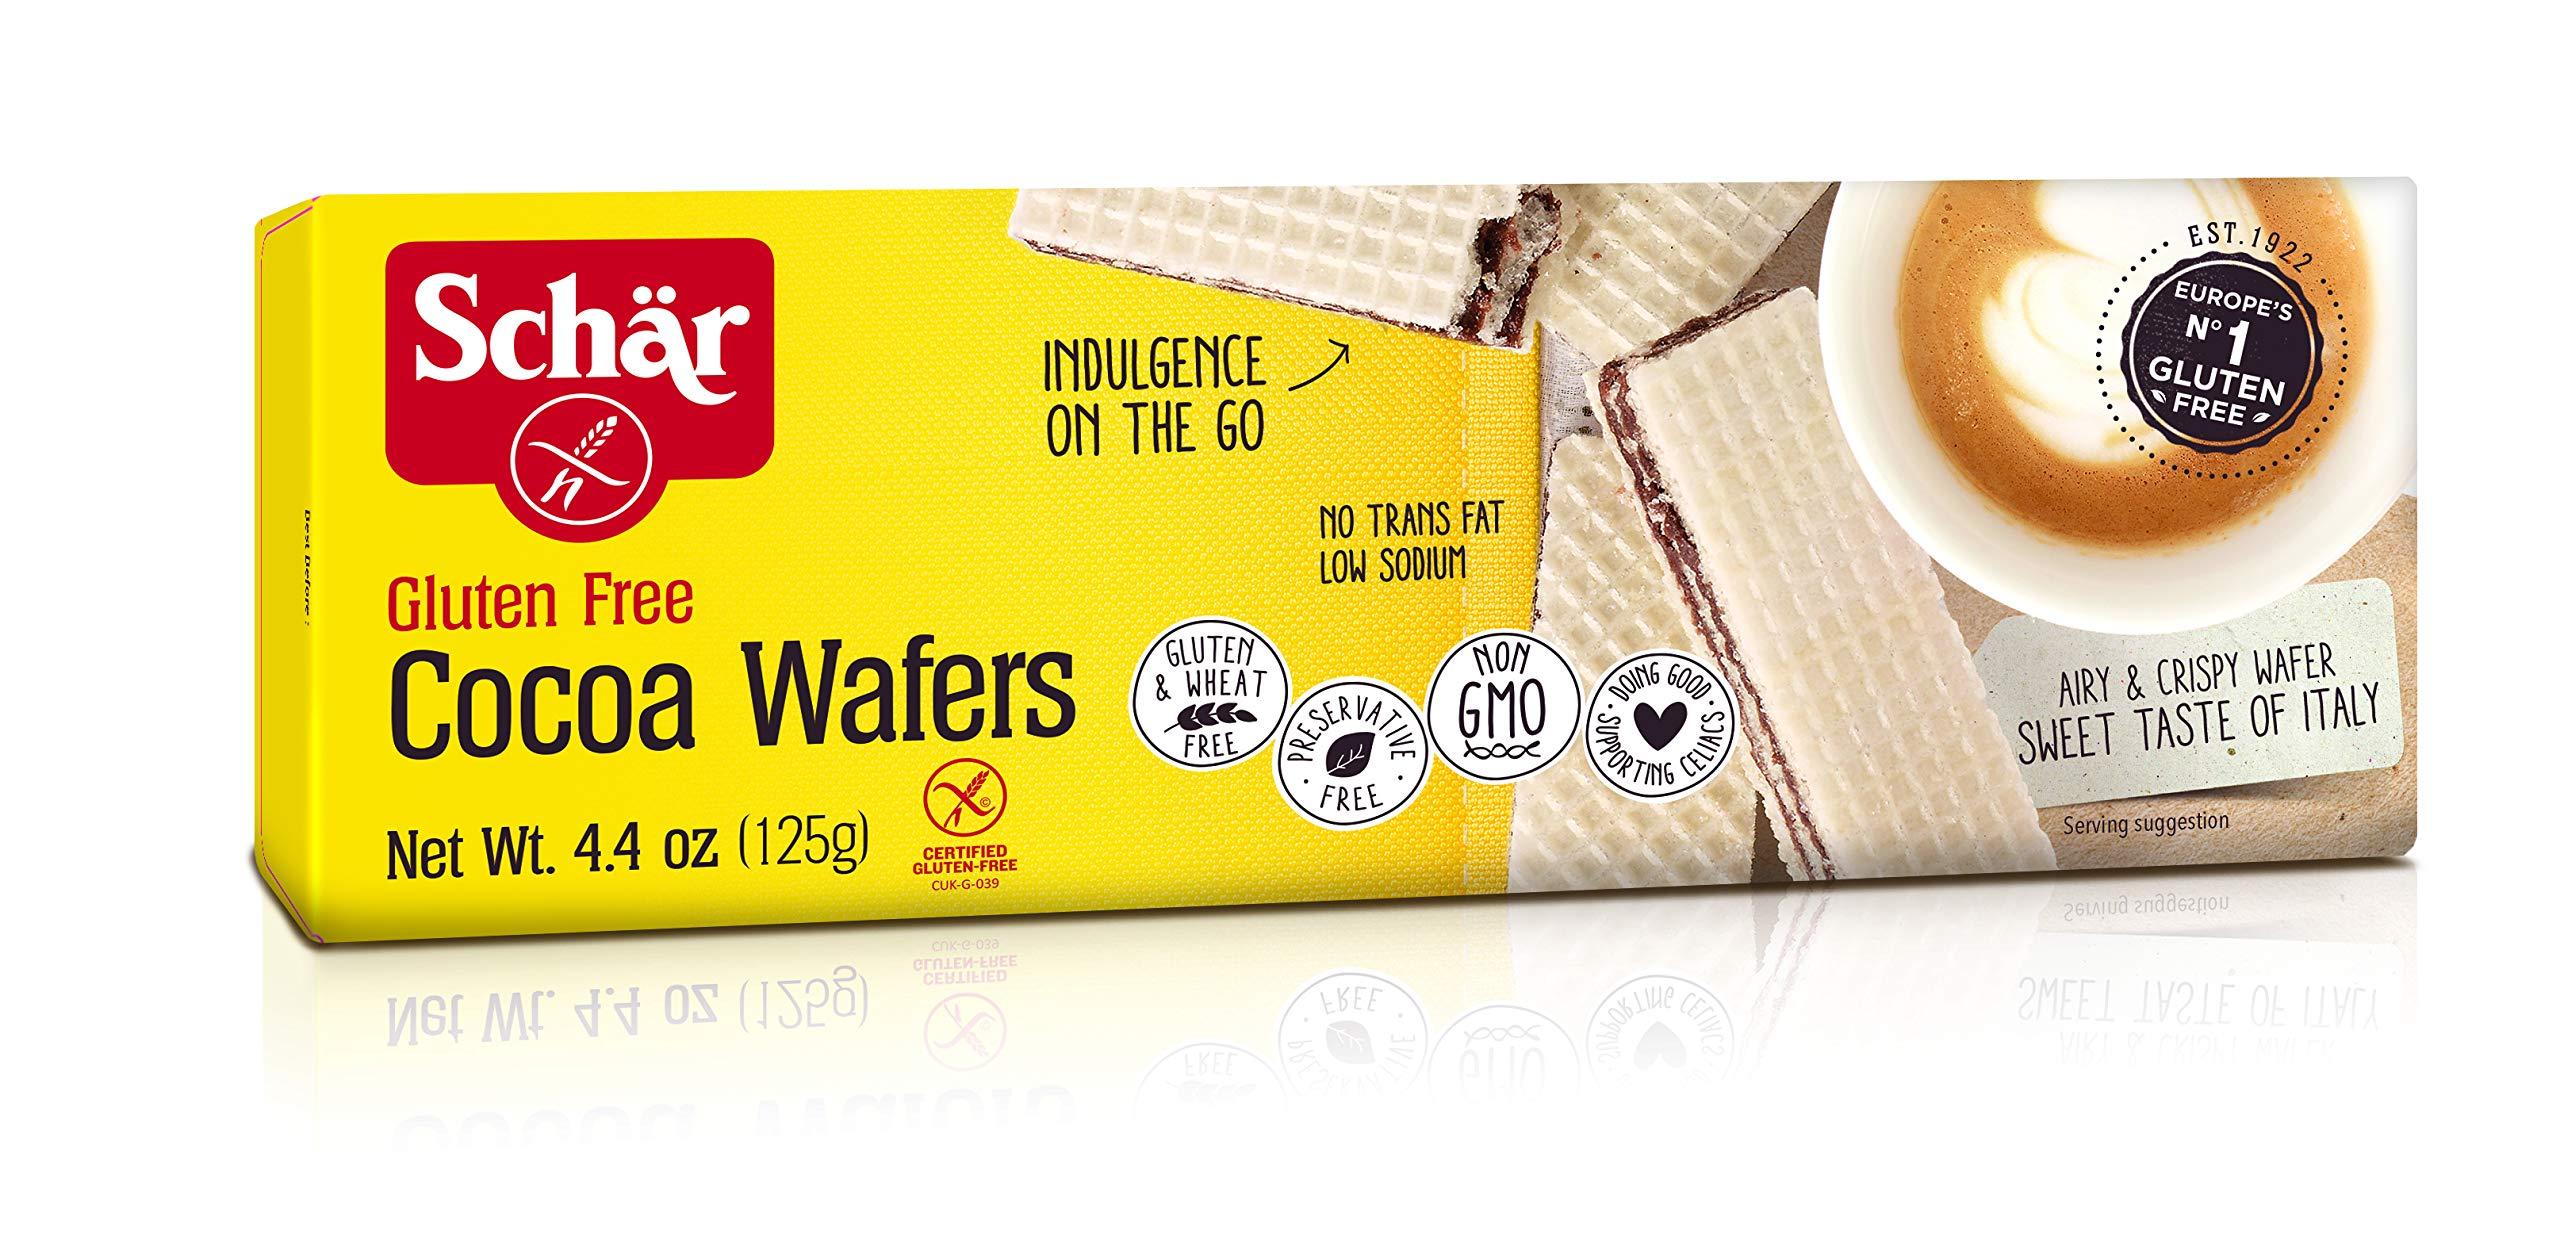 Schär Gluten Free Cocoa Wafers, 4.4 oz., 6-Pack by Schar